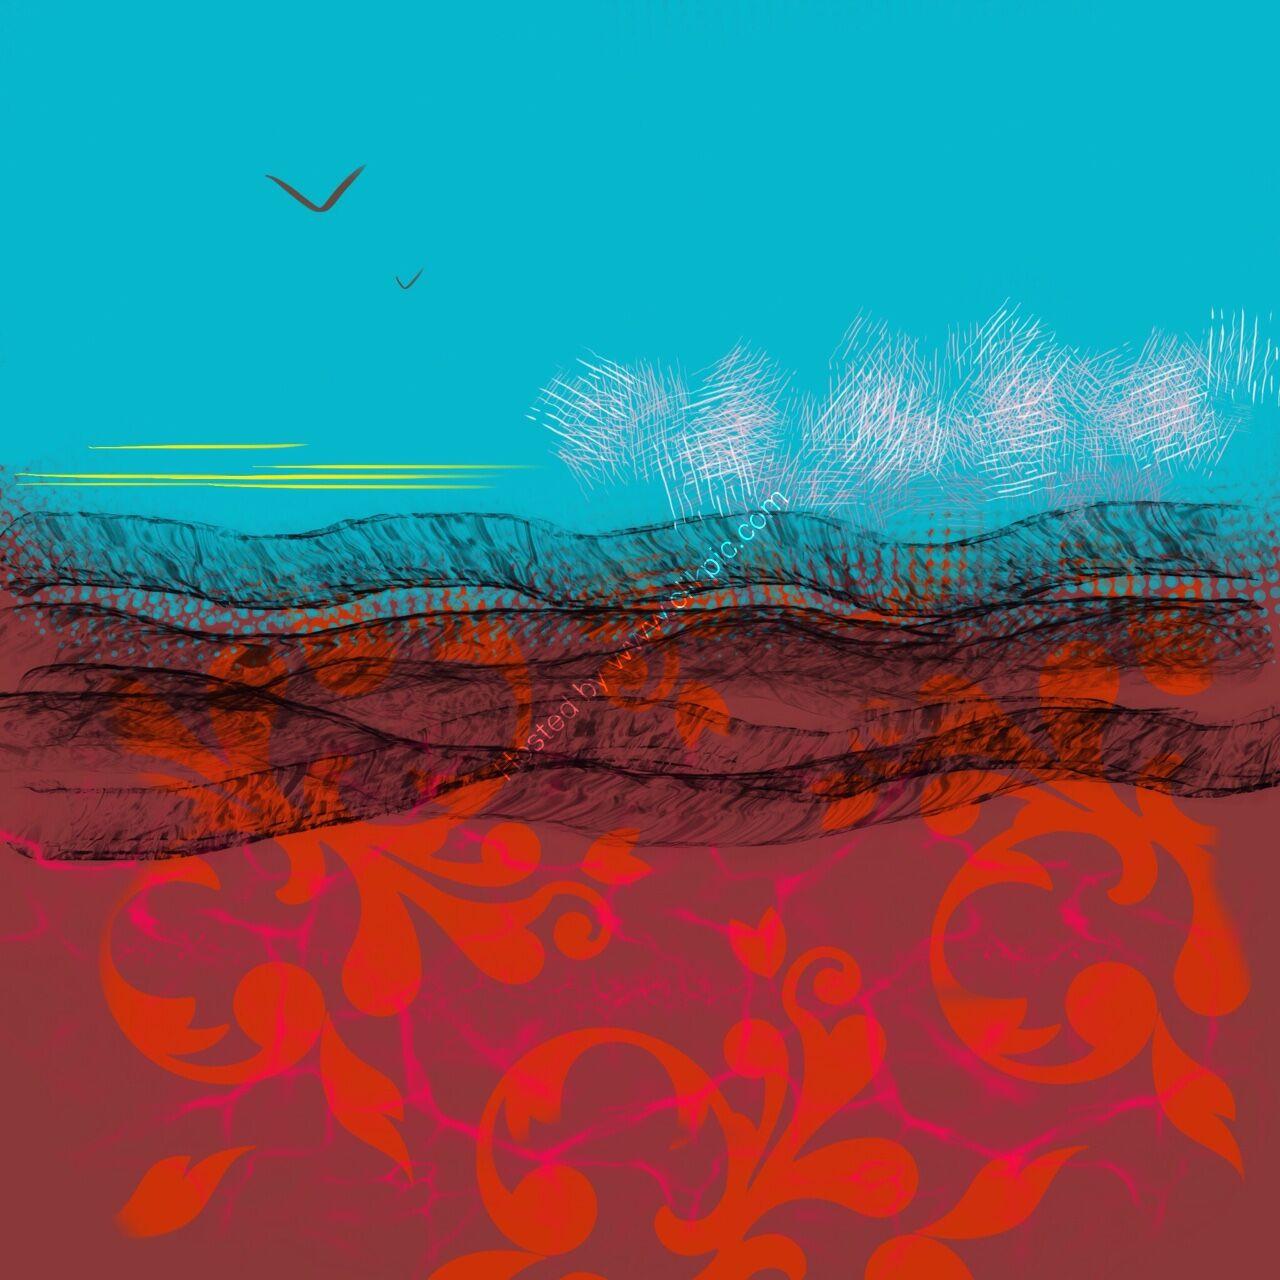 wings, digital drawing